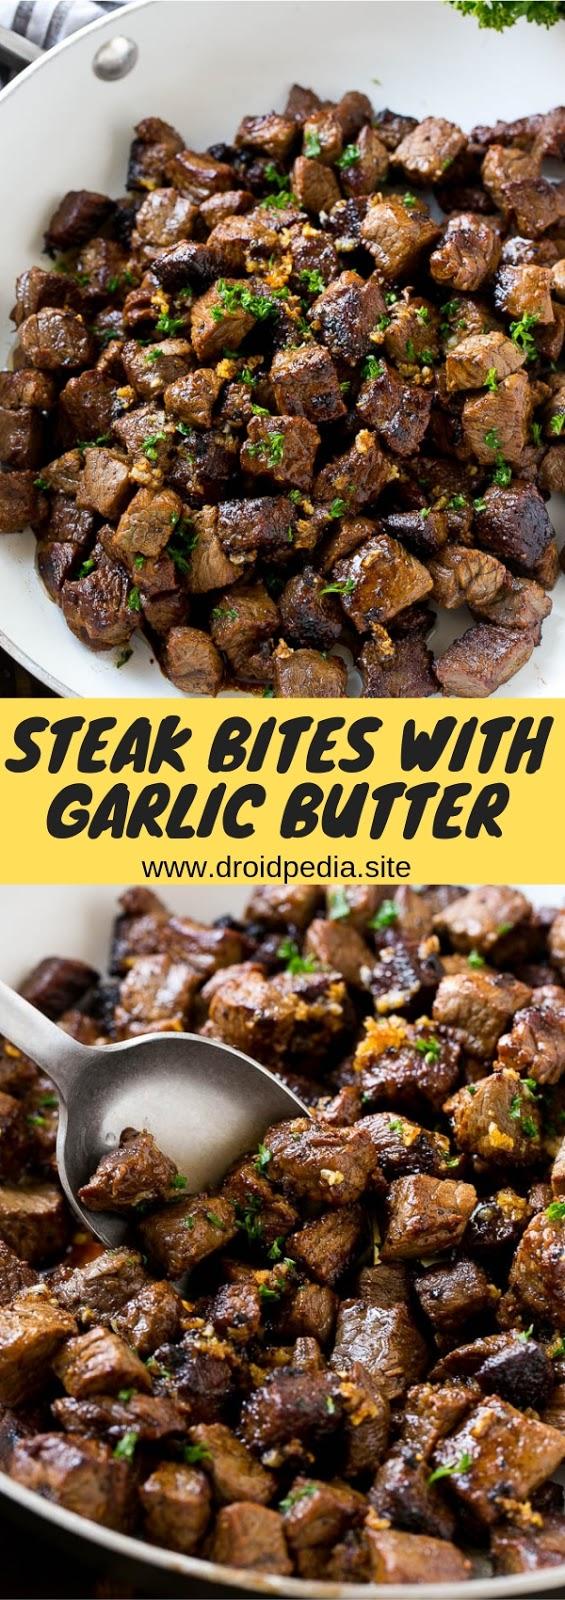 Steak Bites with Garlic Butter #dinner #appetizer #american #steak #bites